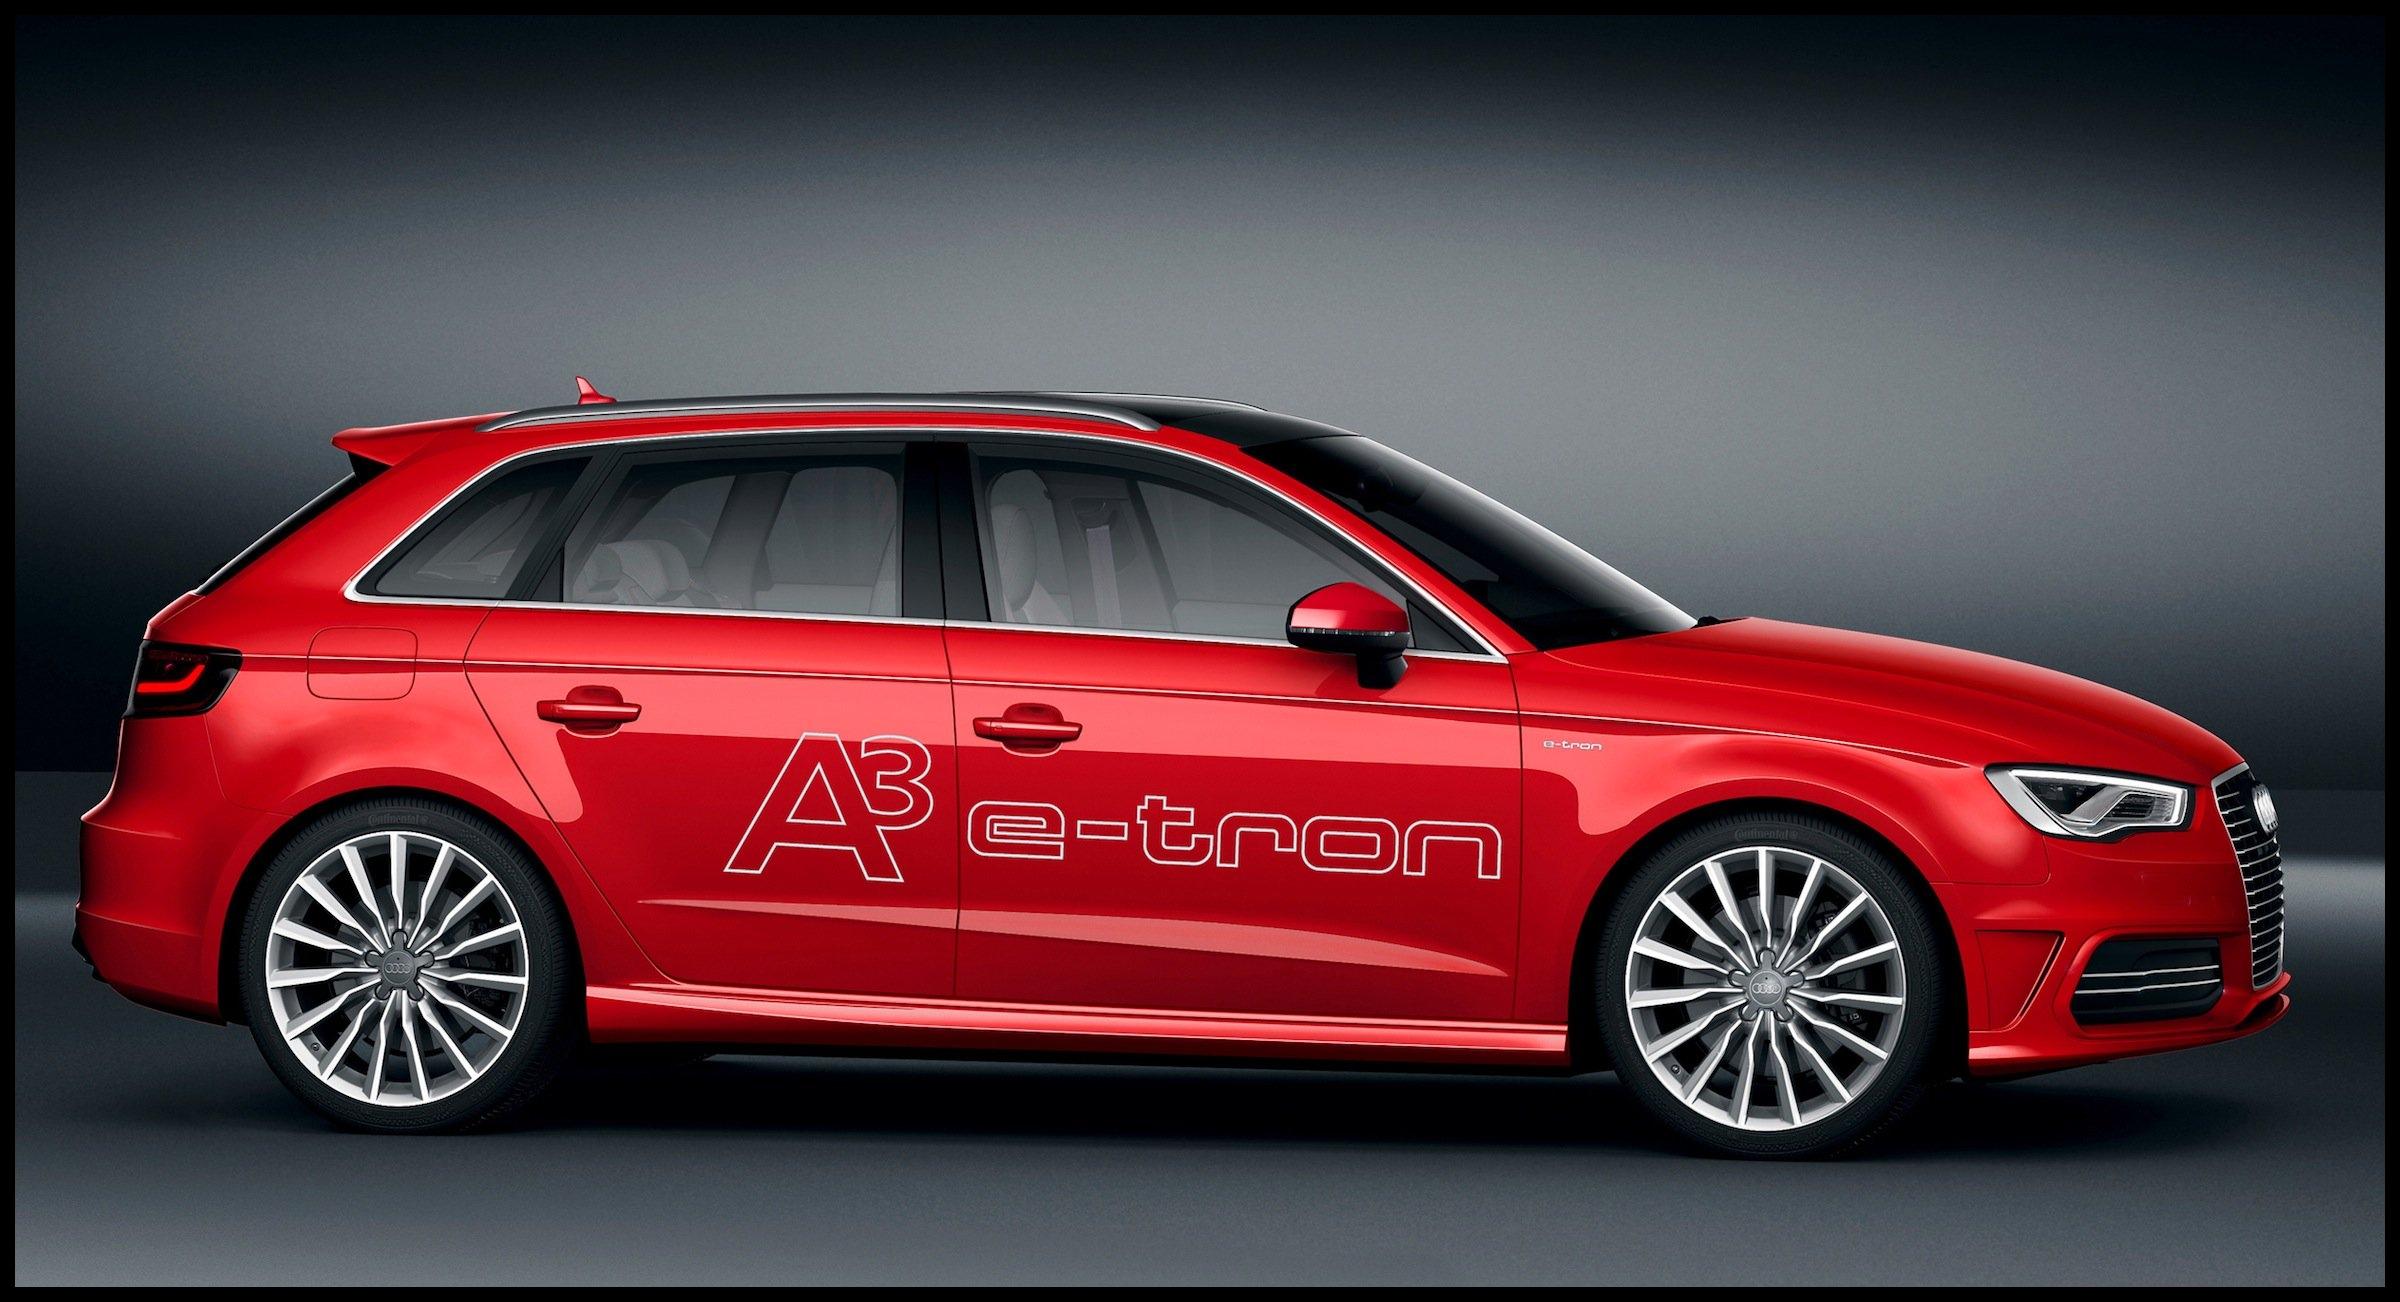 Audi A3 e tron concept nails 1 5L 100km fuel economy